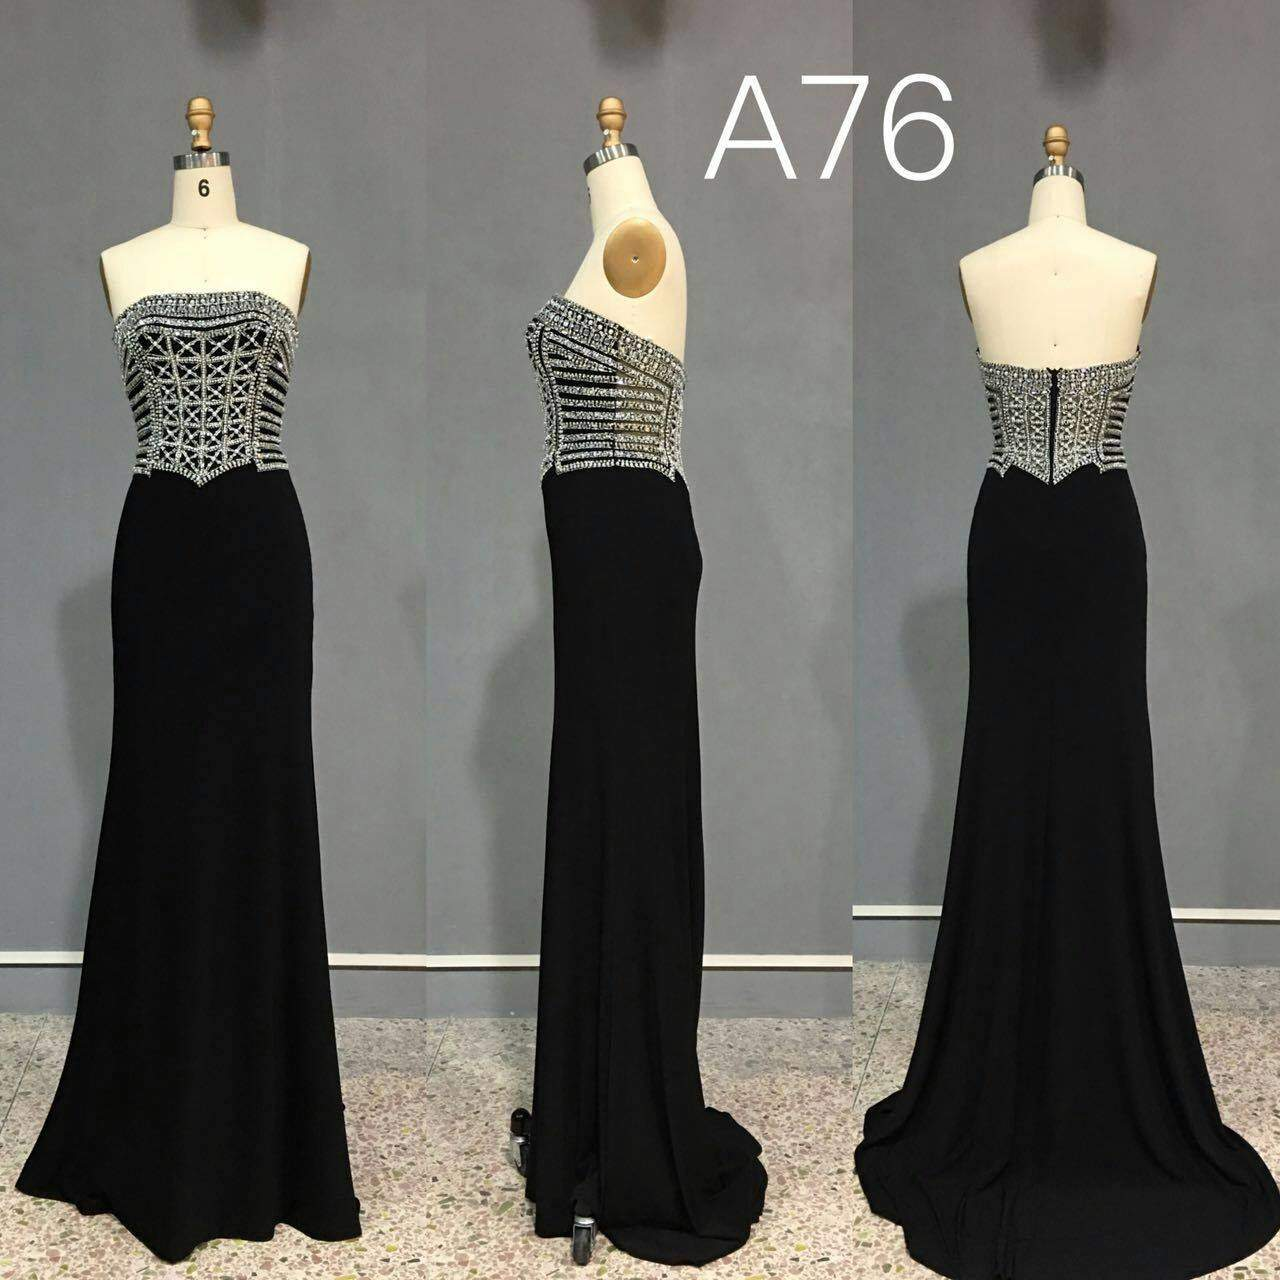 0c090c70278 Strapless black formal dresses - Darius Cordell Fashion Ltd